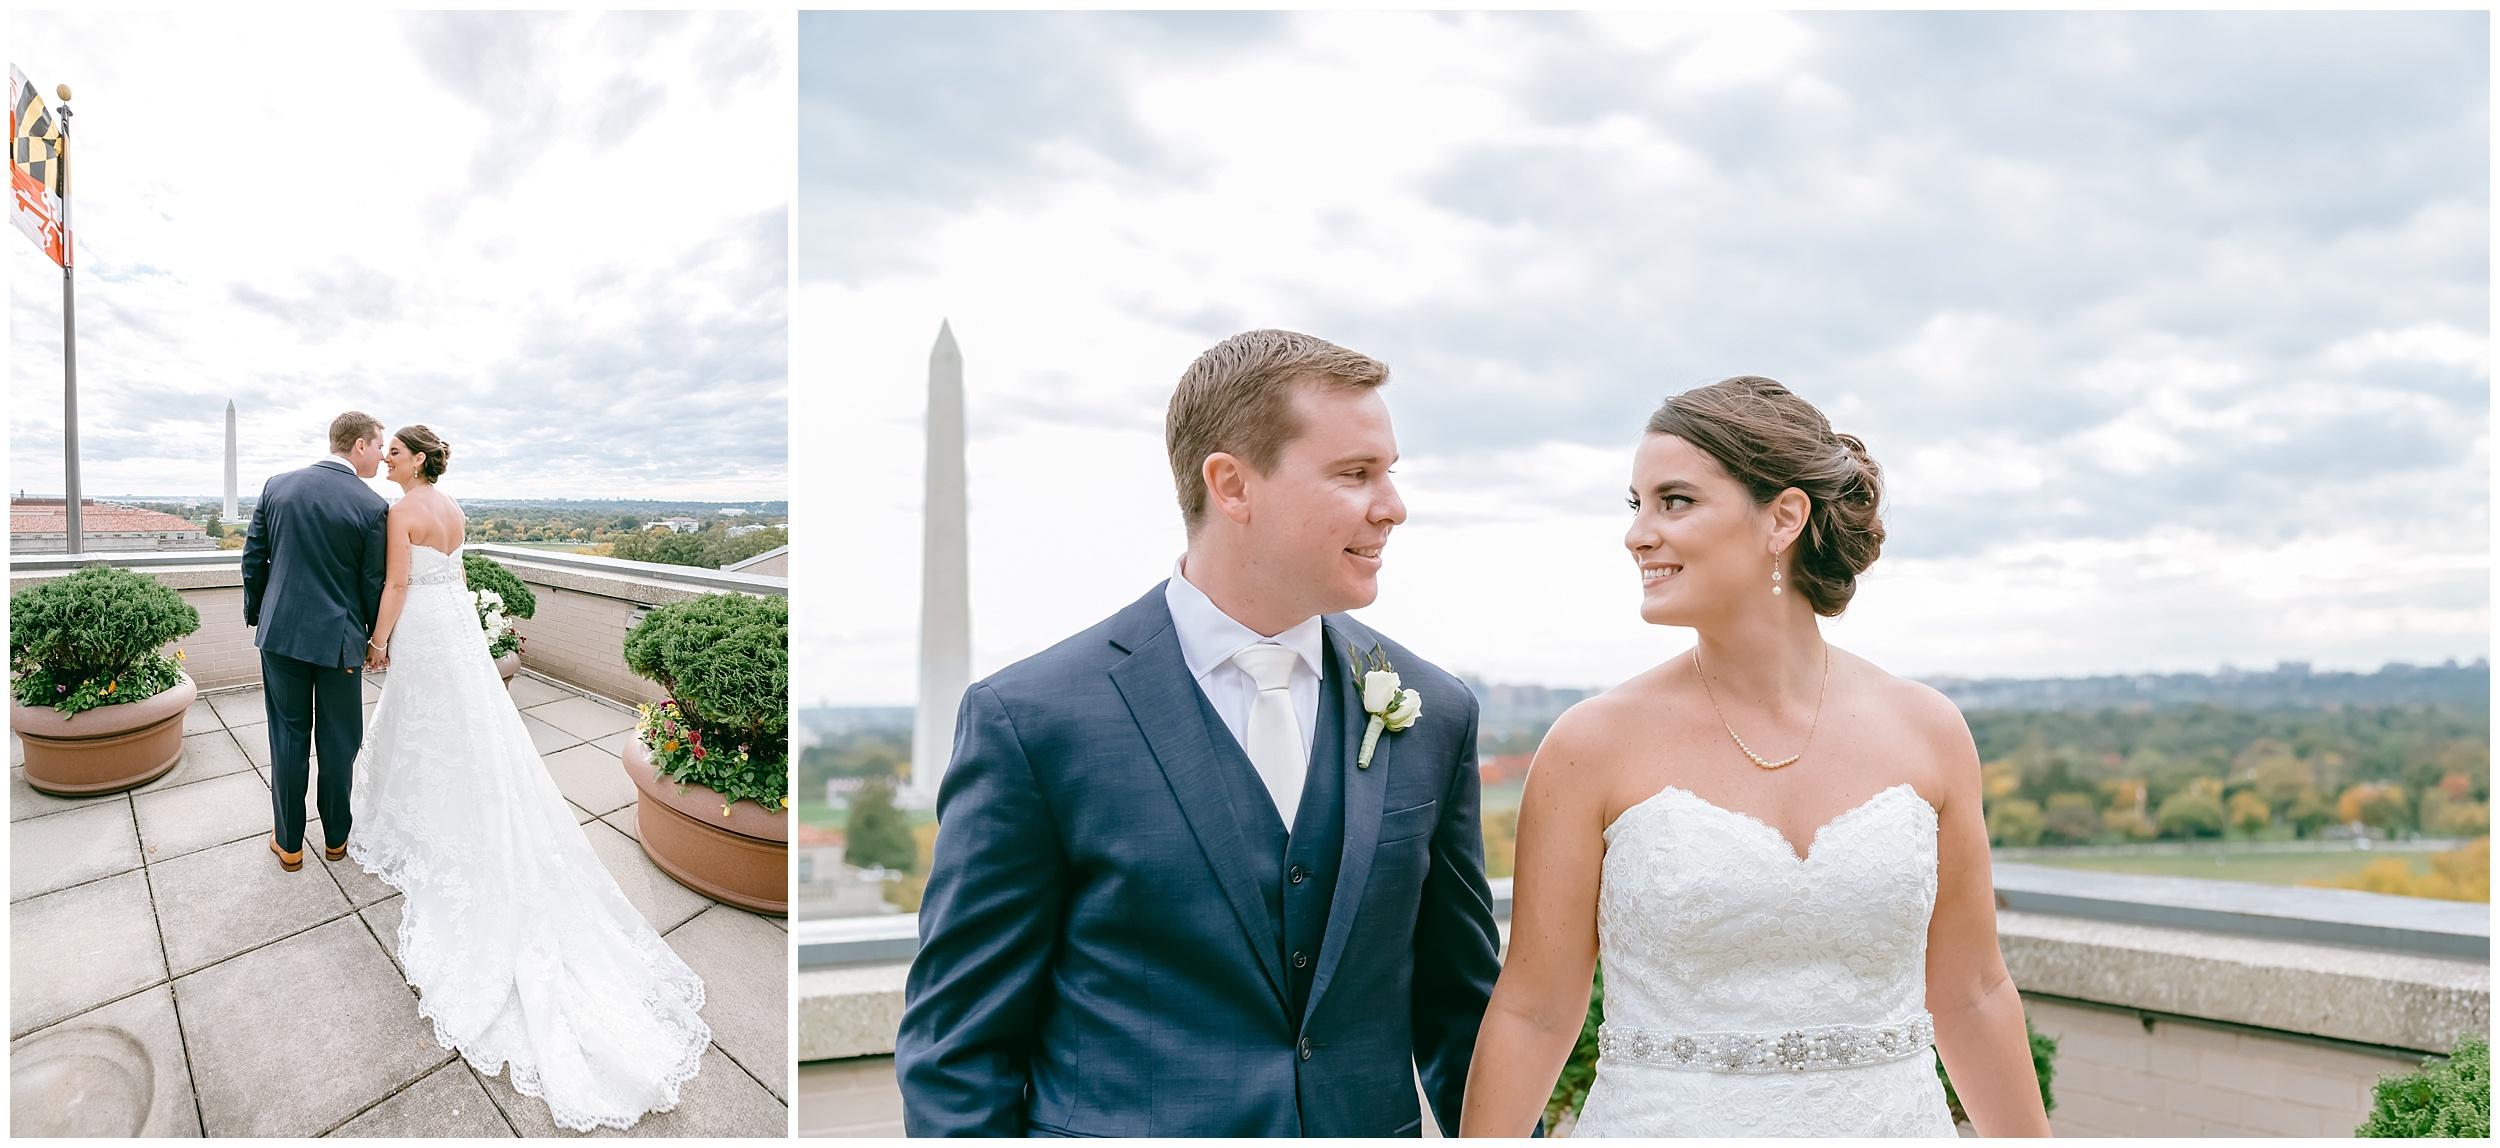 wedding-portrait-rooftop-willard-hotel-first-look-washington-dc-photographer